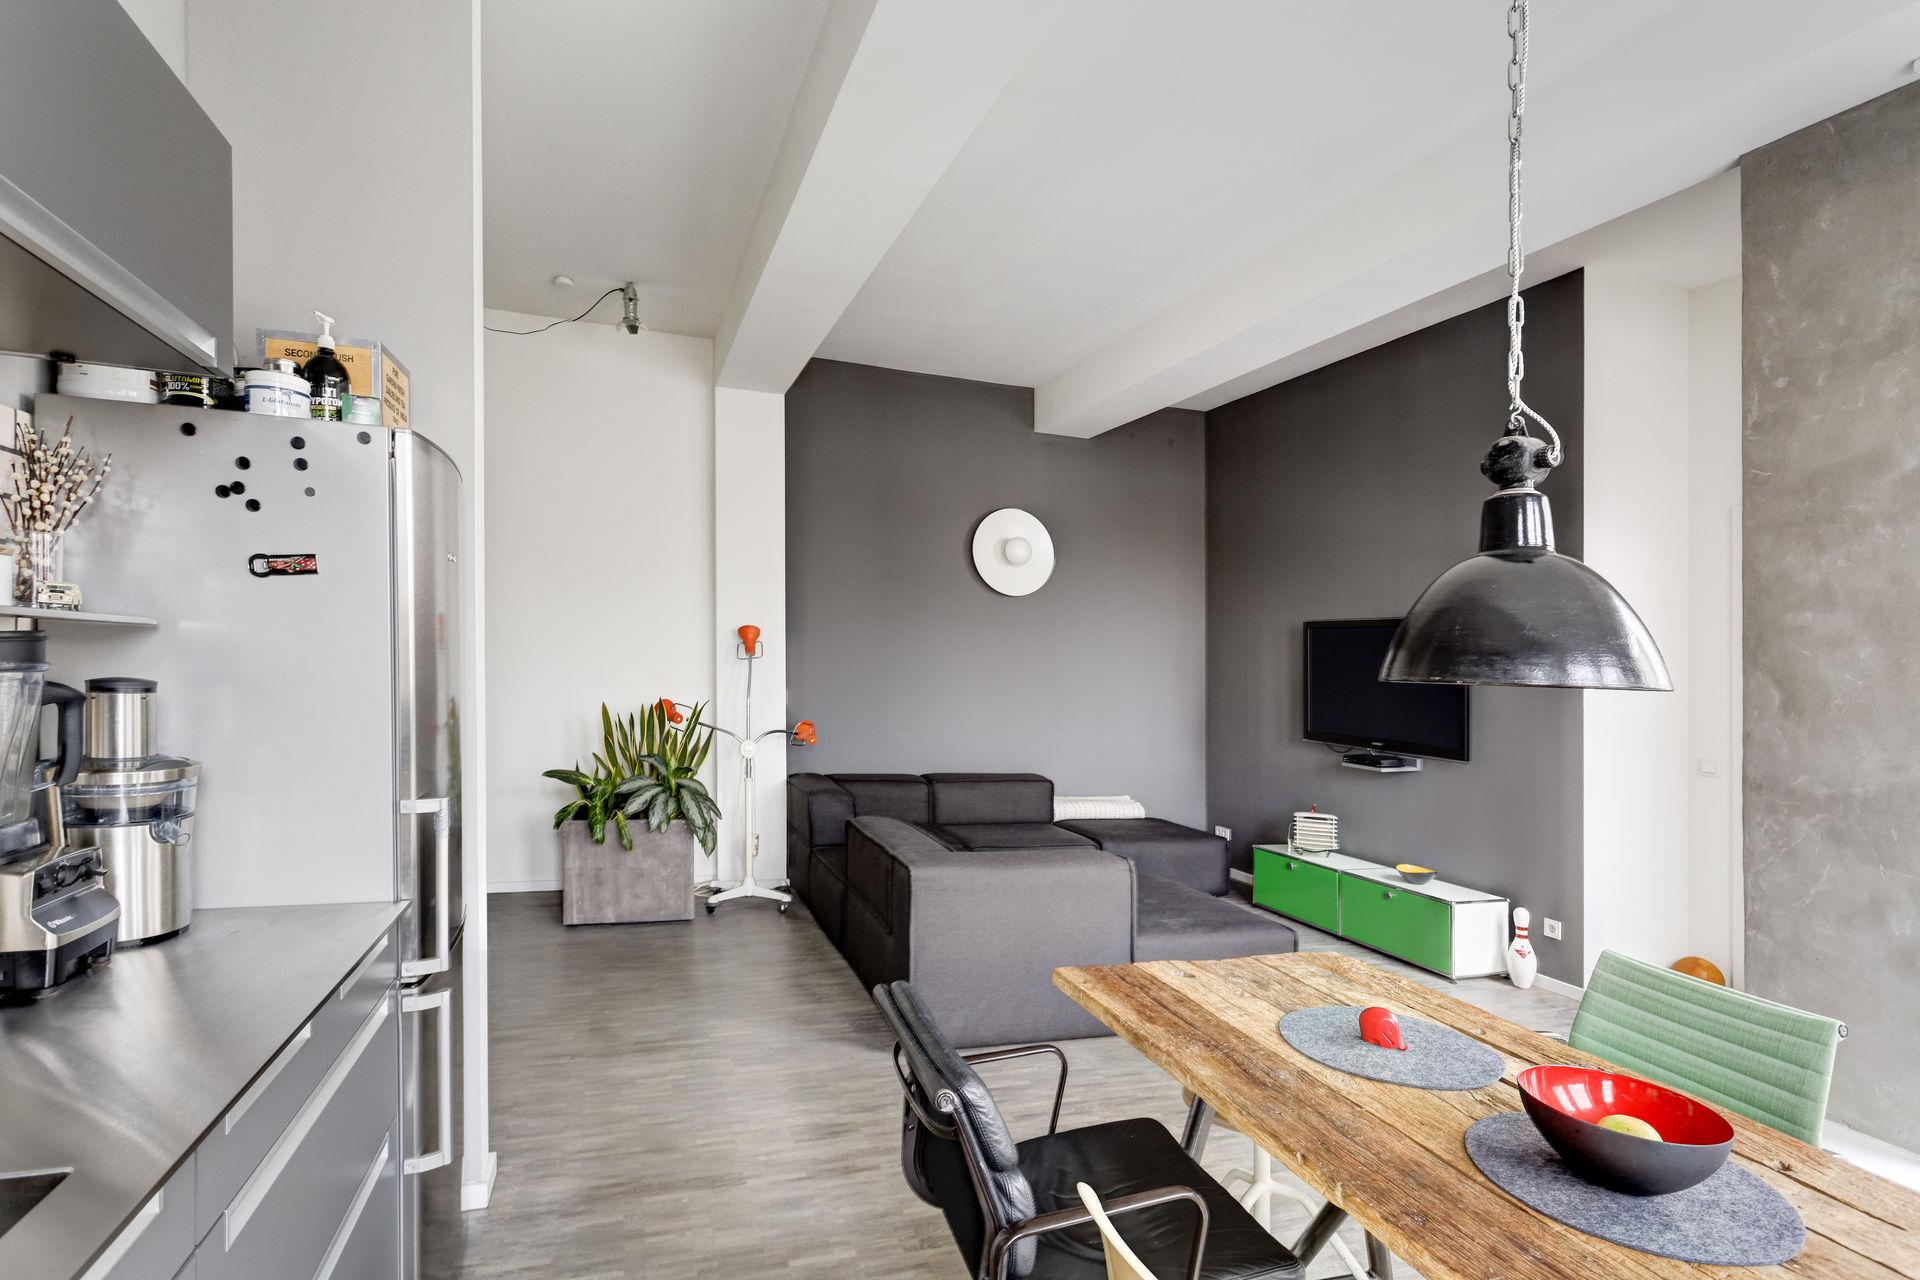 saniertes loft in alter fabrik mit terrasse. Black Bedroom Furniture Sets. Home Design Ideas